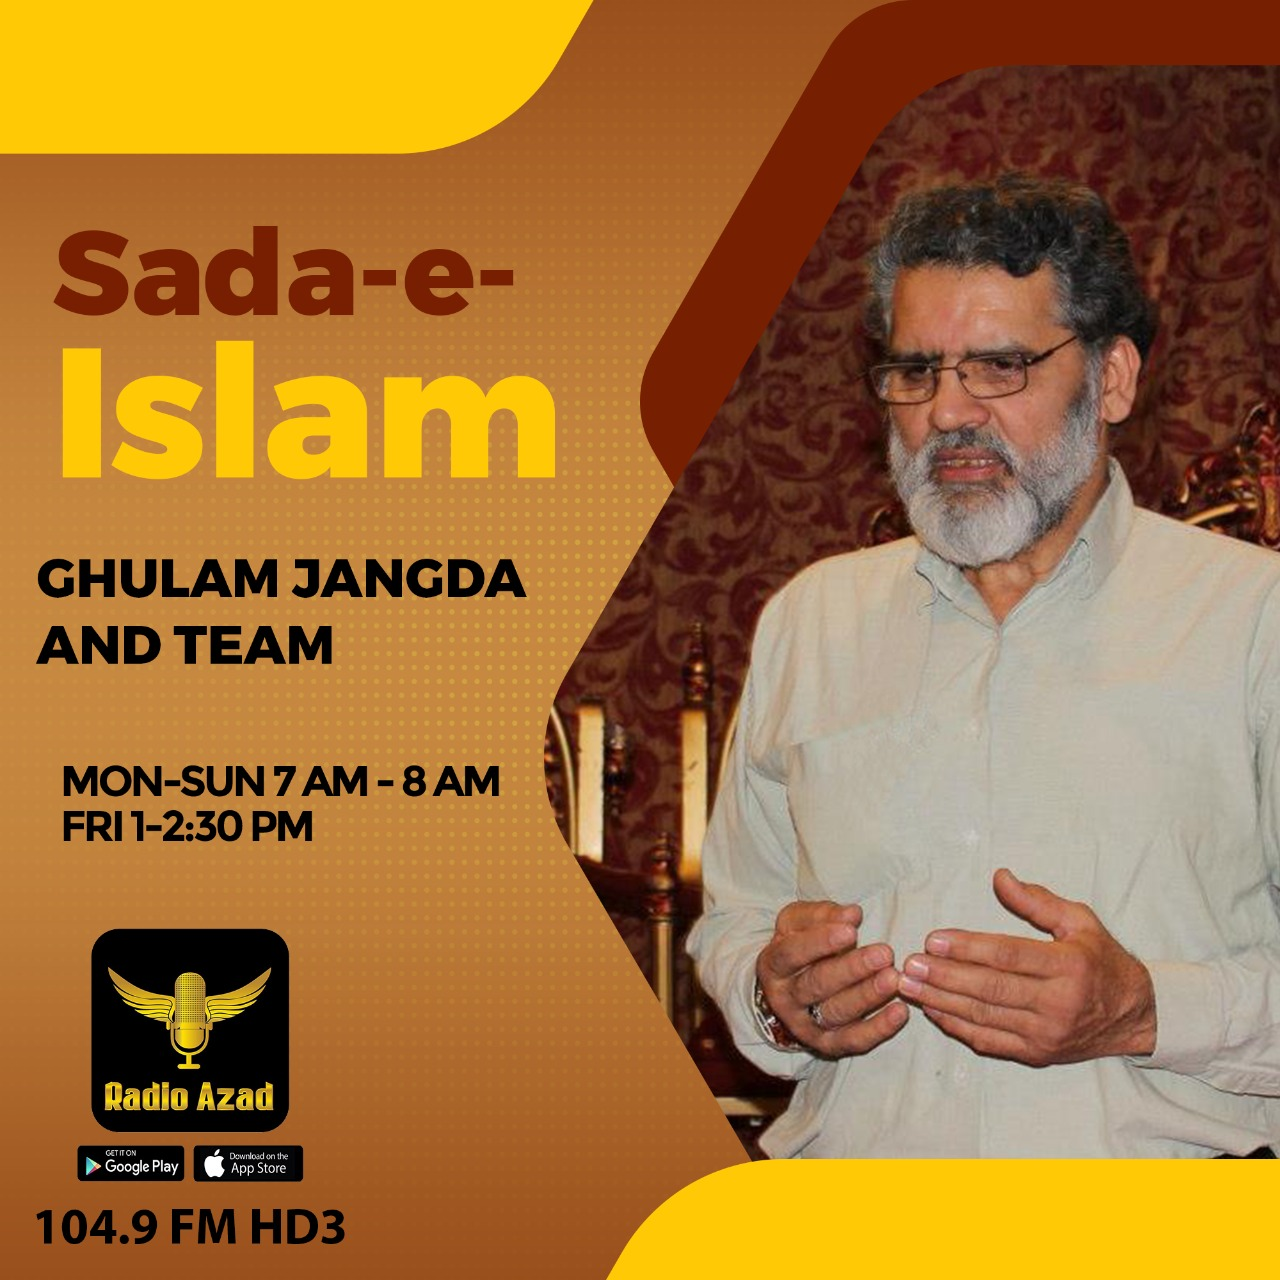 SADA-E-ISLAM – GULHAM JANGDA